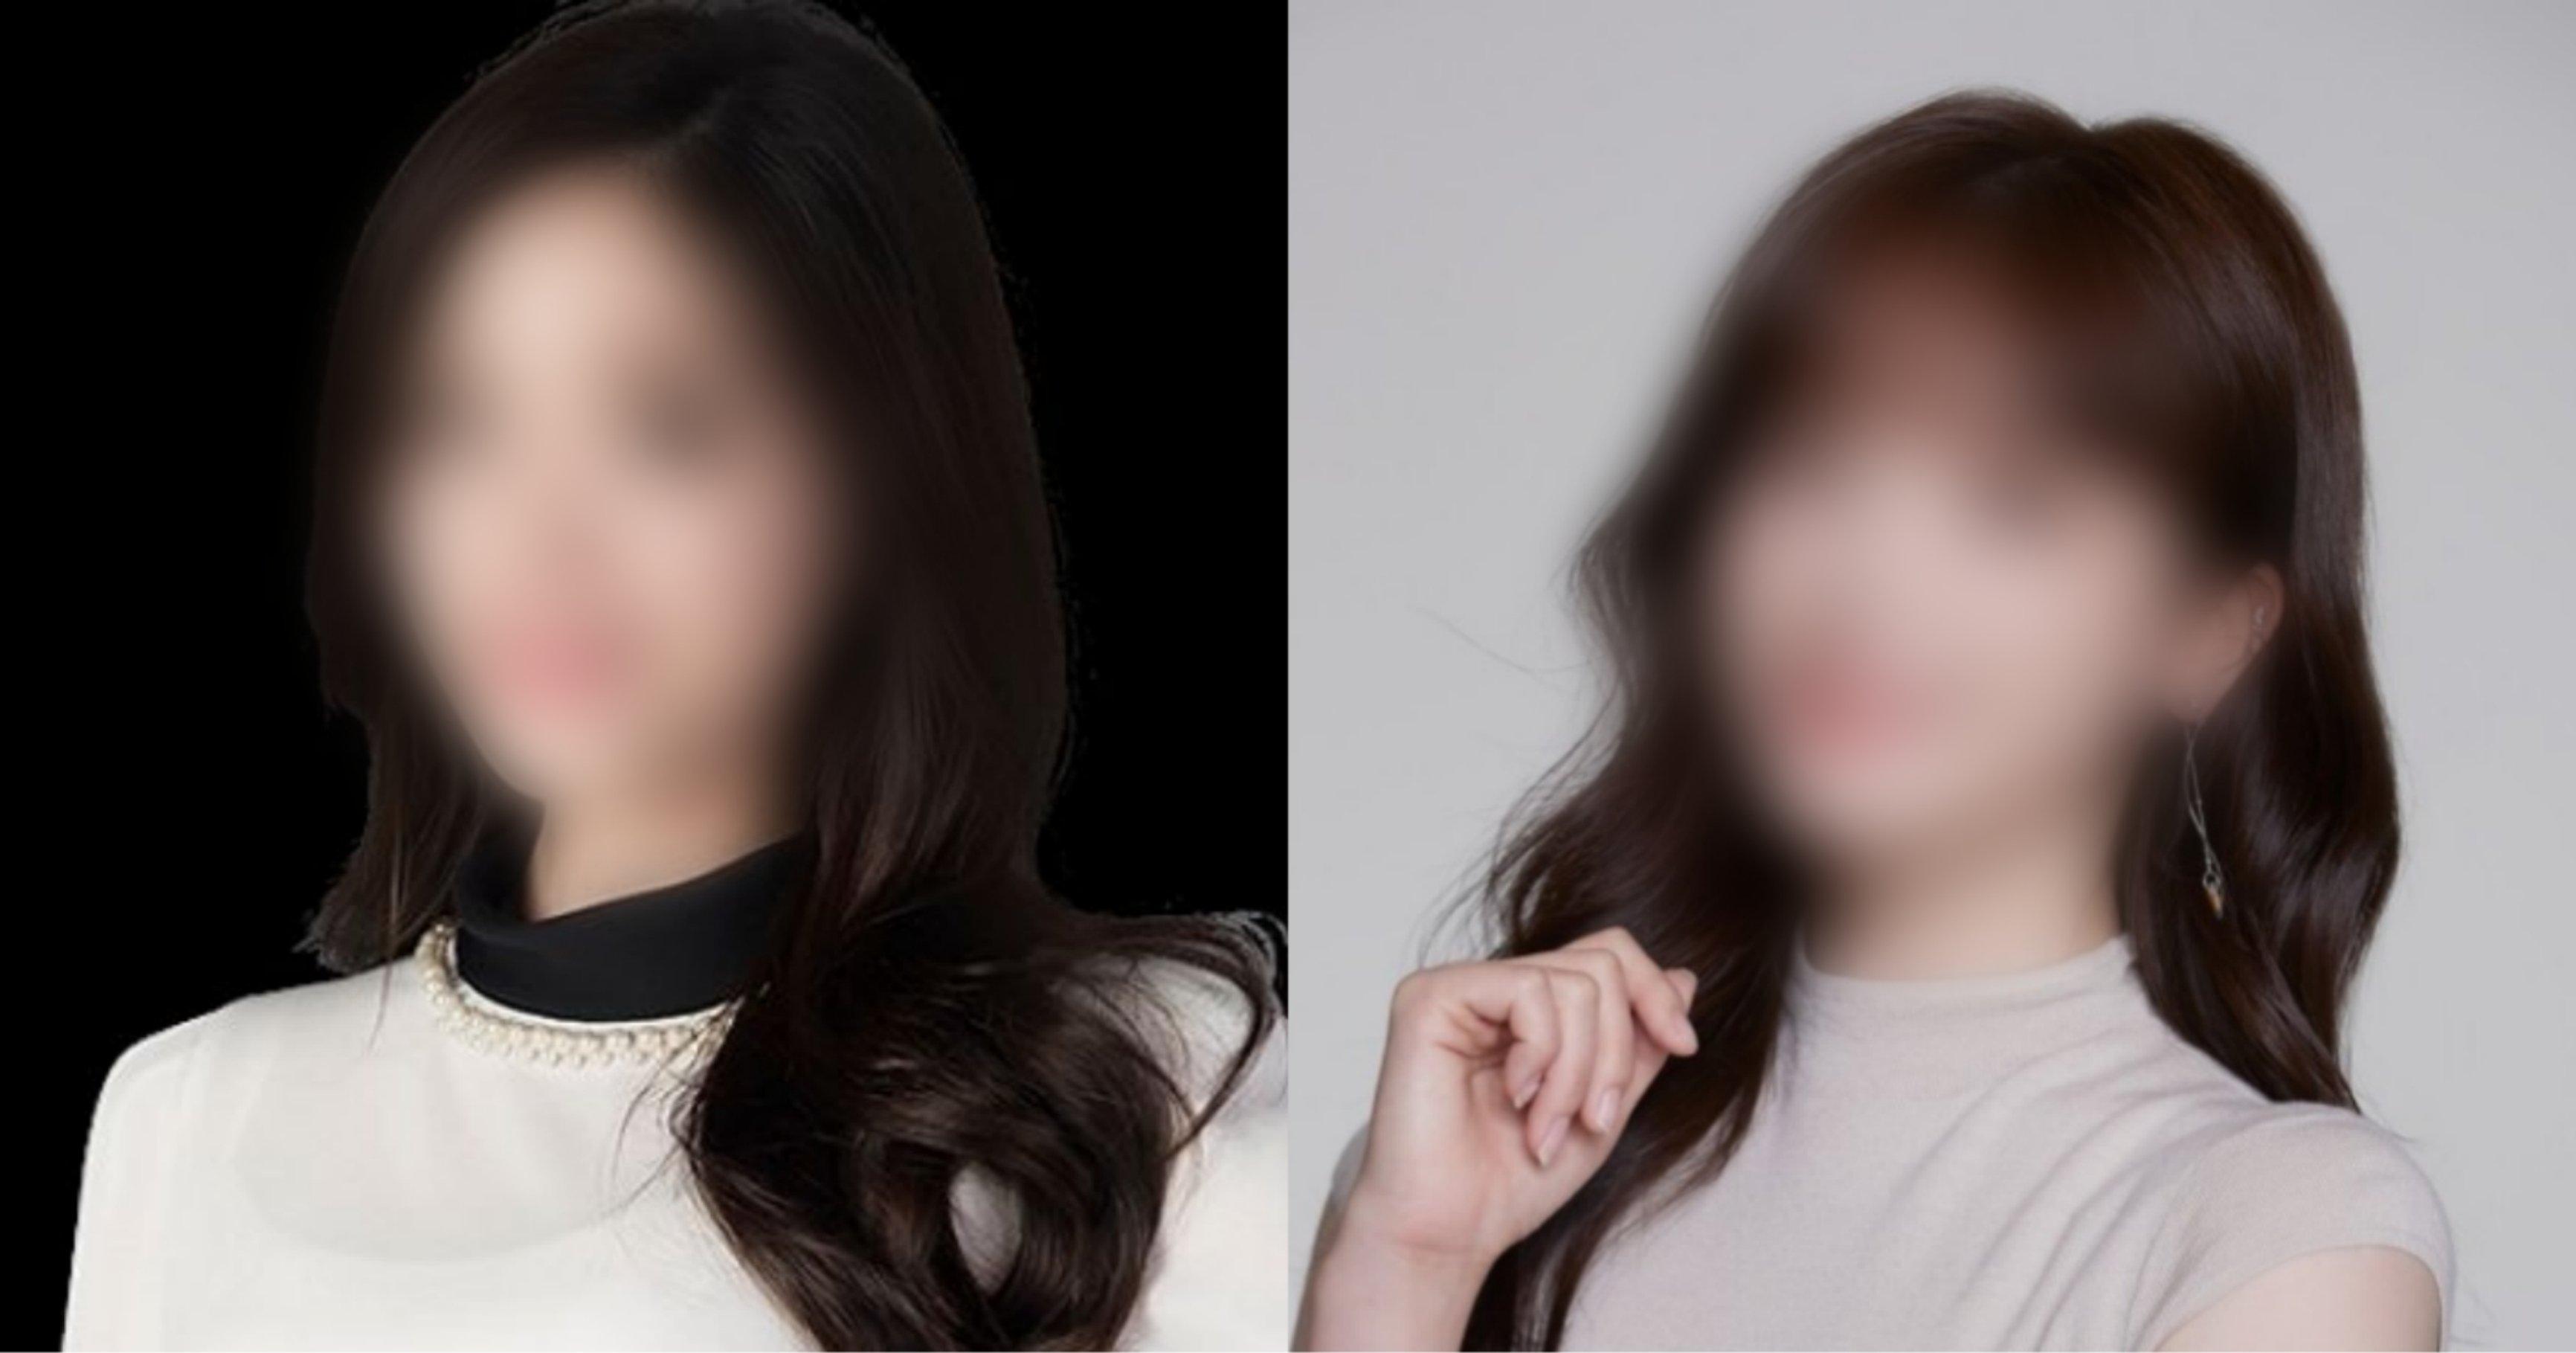 kakaotalk 20211012 162355944.jpg?resize=412,232 - 학원 홈페이지에 올라온 사진을 뛰어넘는 미모로 '토익 여신'이라 불리는 강사의 정체